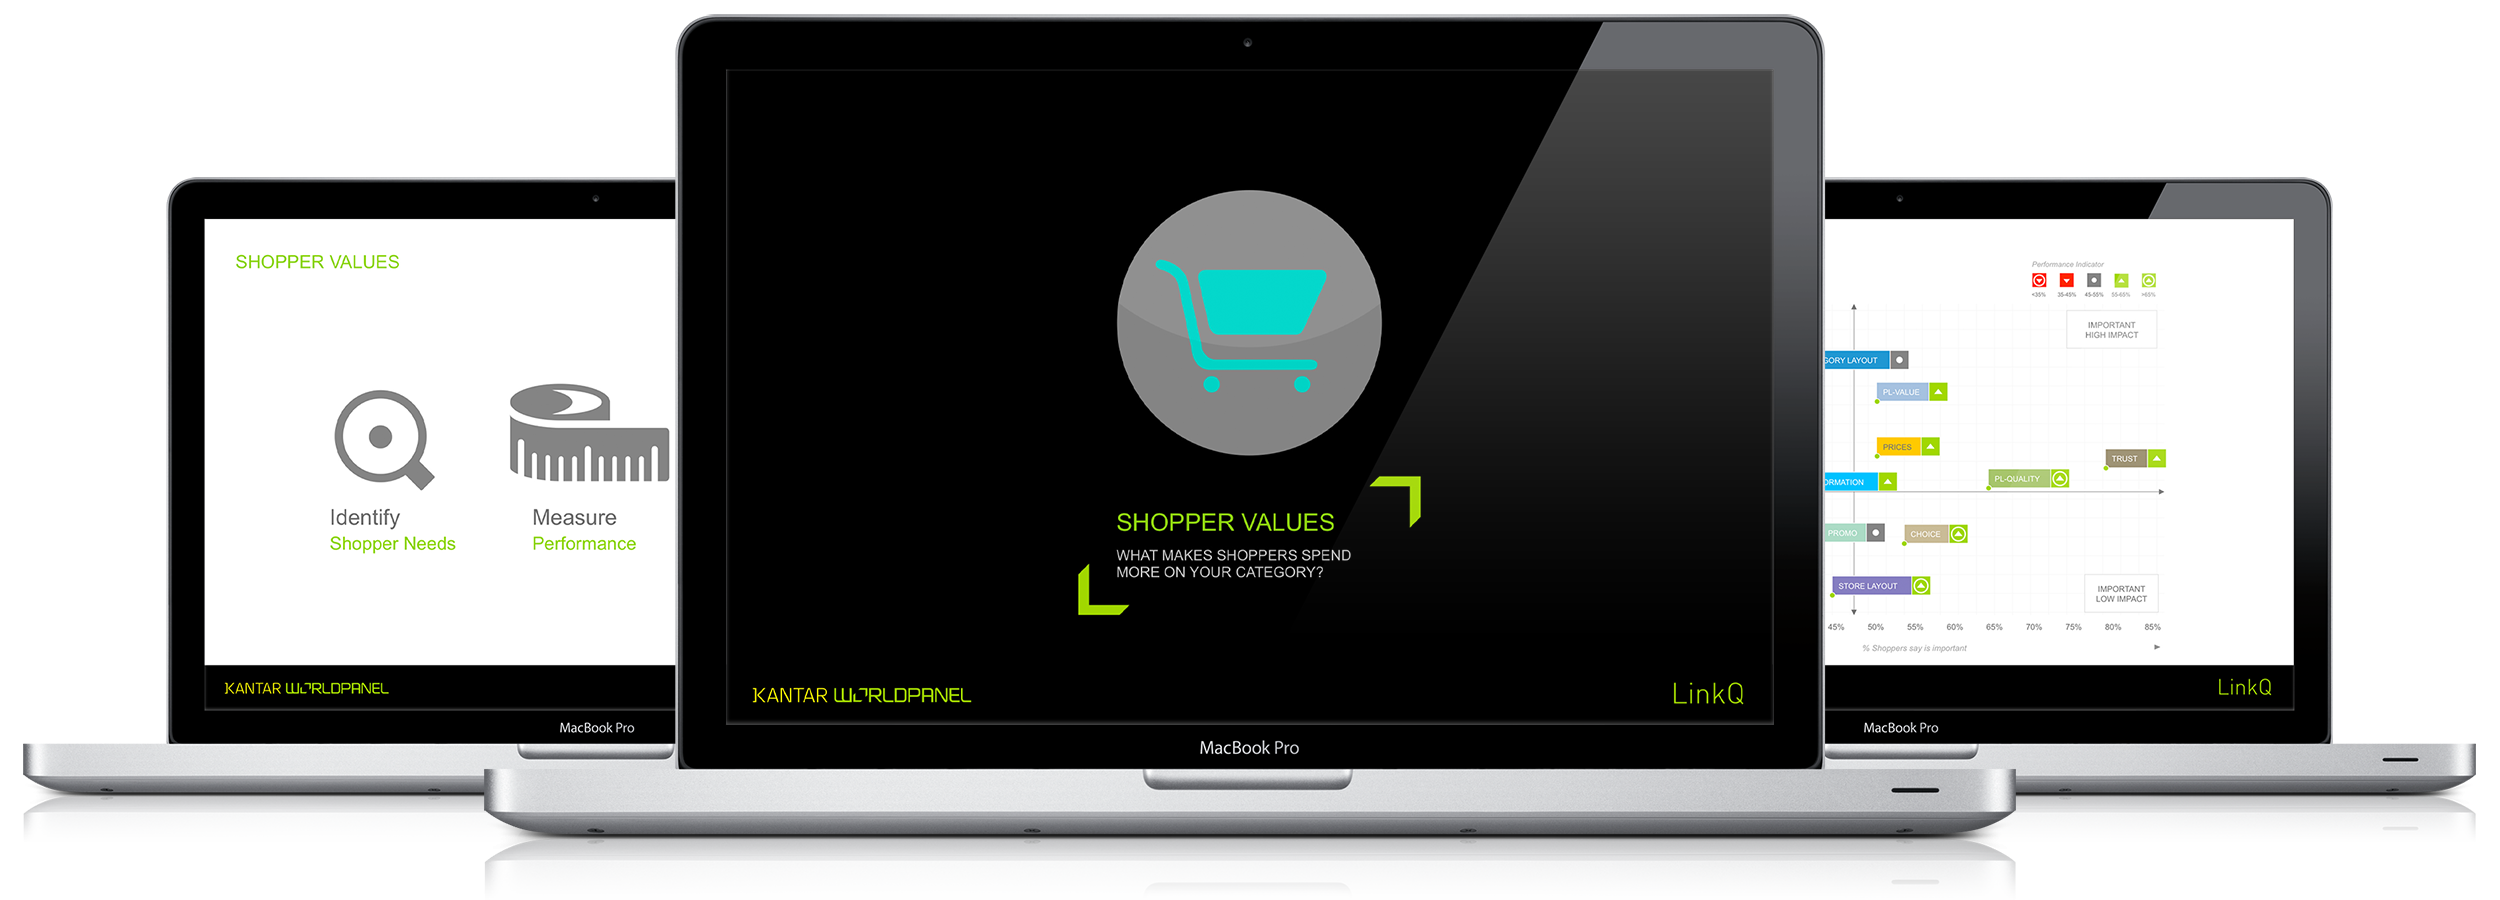 KWP-Shopper-Values-Laptop-Triple